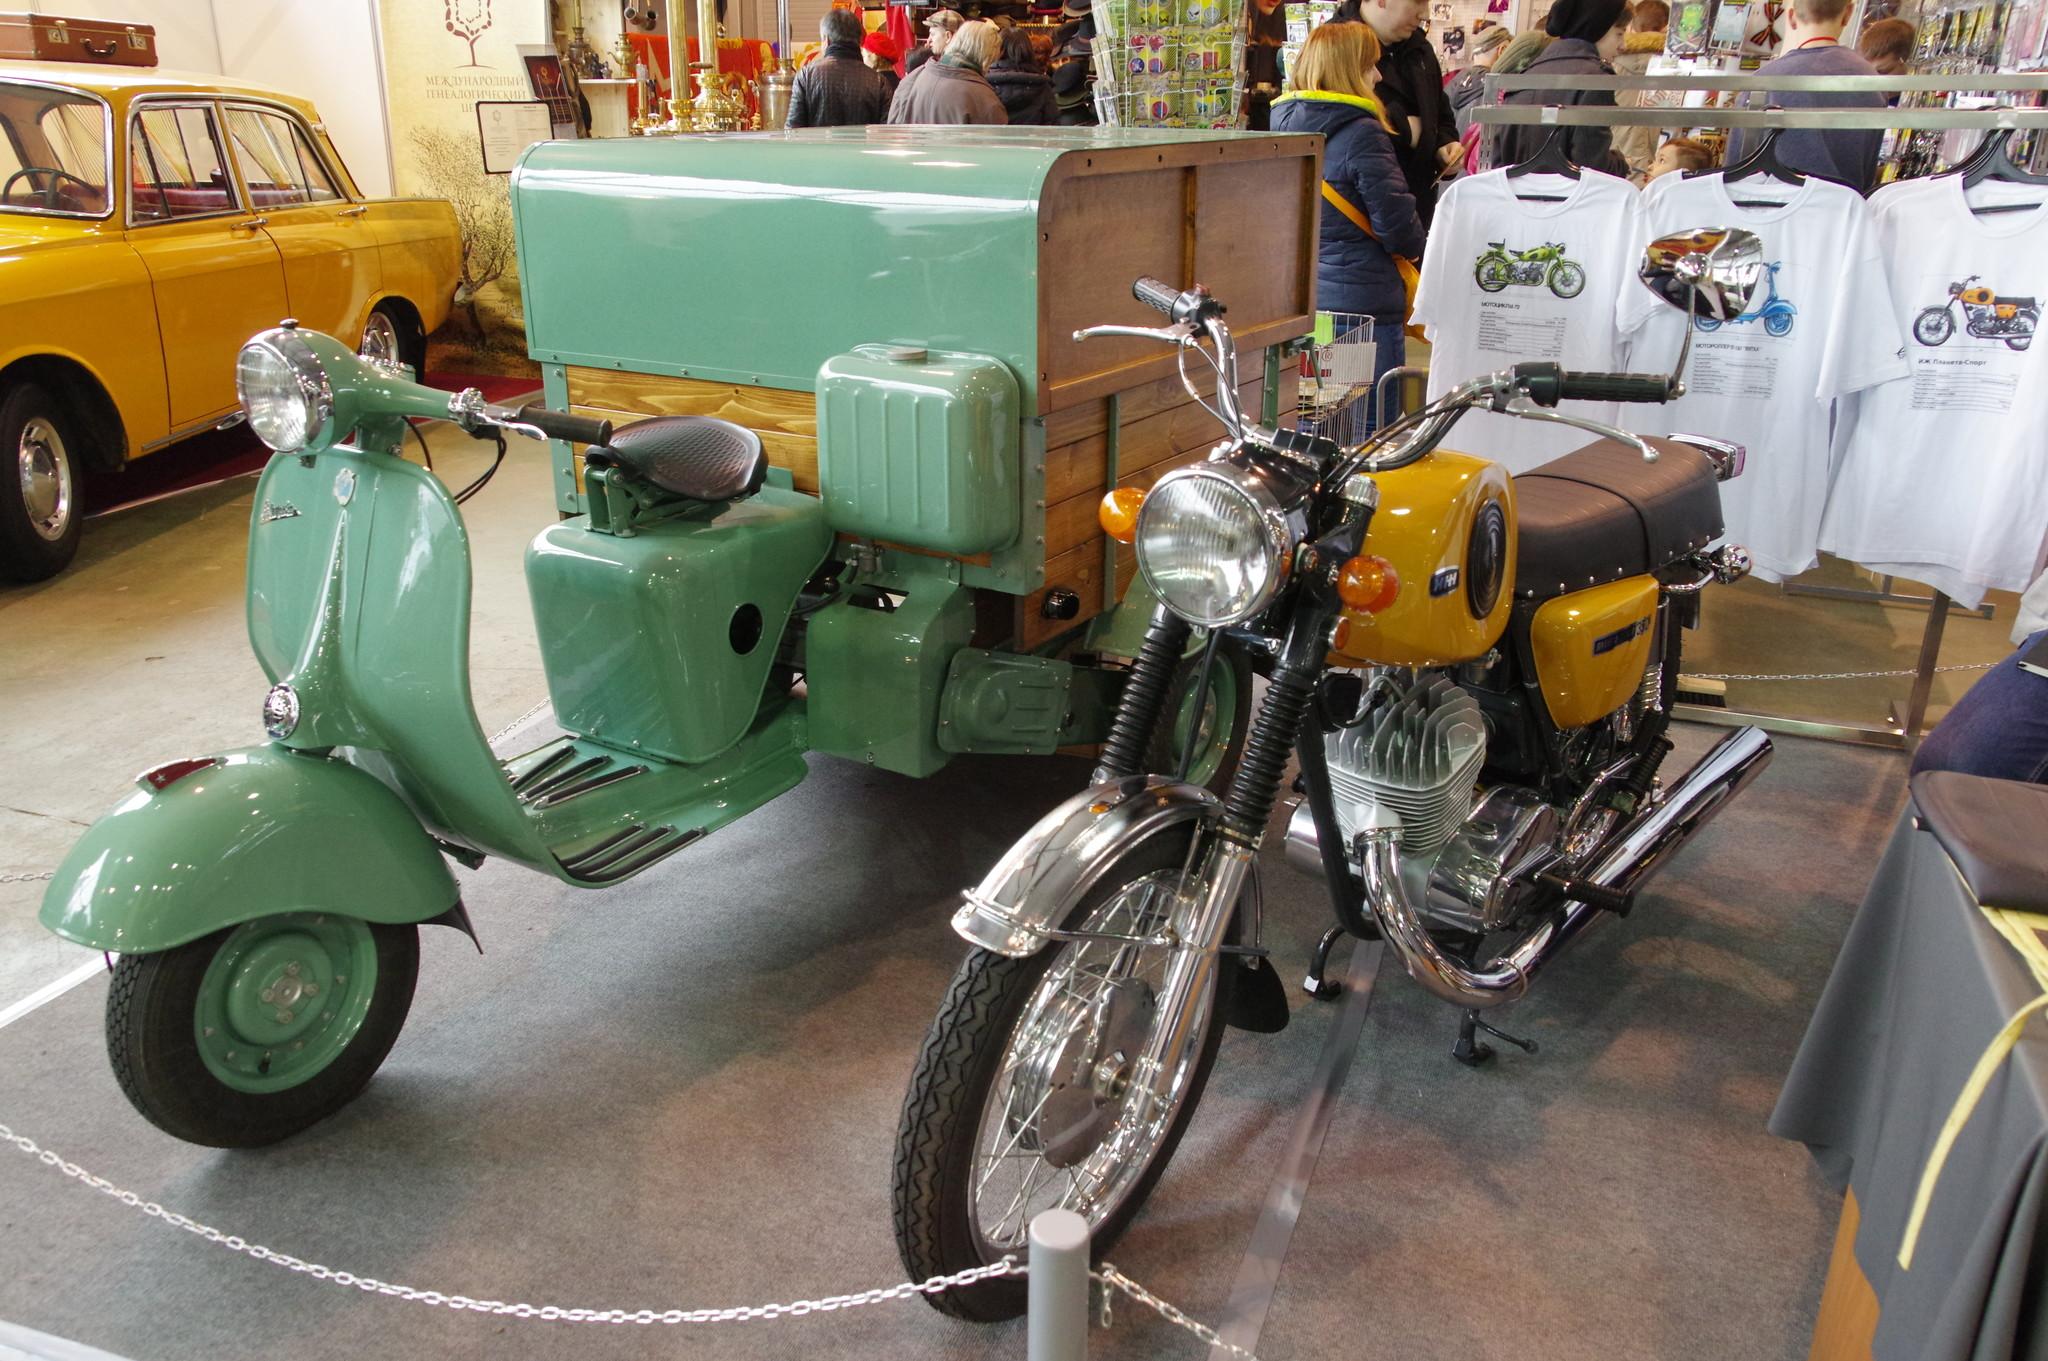 Трёхколёсный мотороллер «Вятка МГ-150» и мотоцикл «Иж Планета Спорт 350»